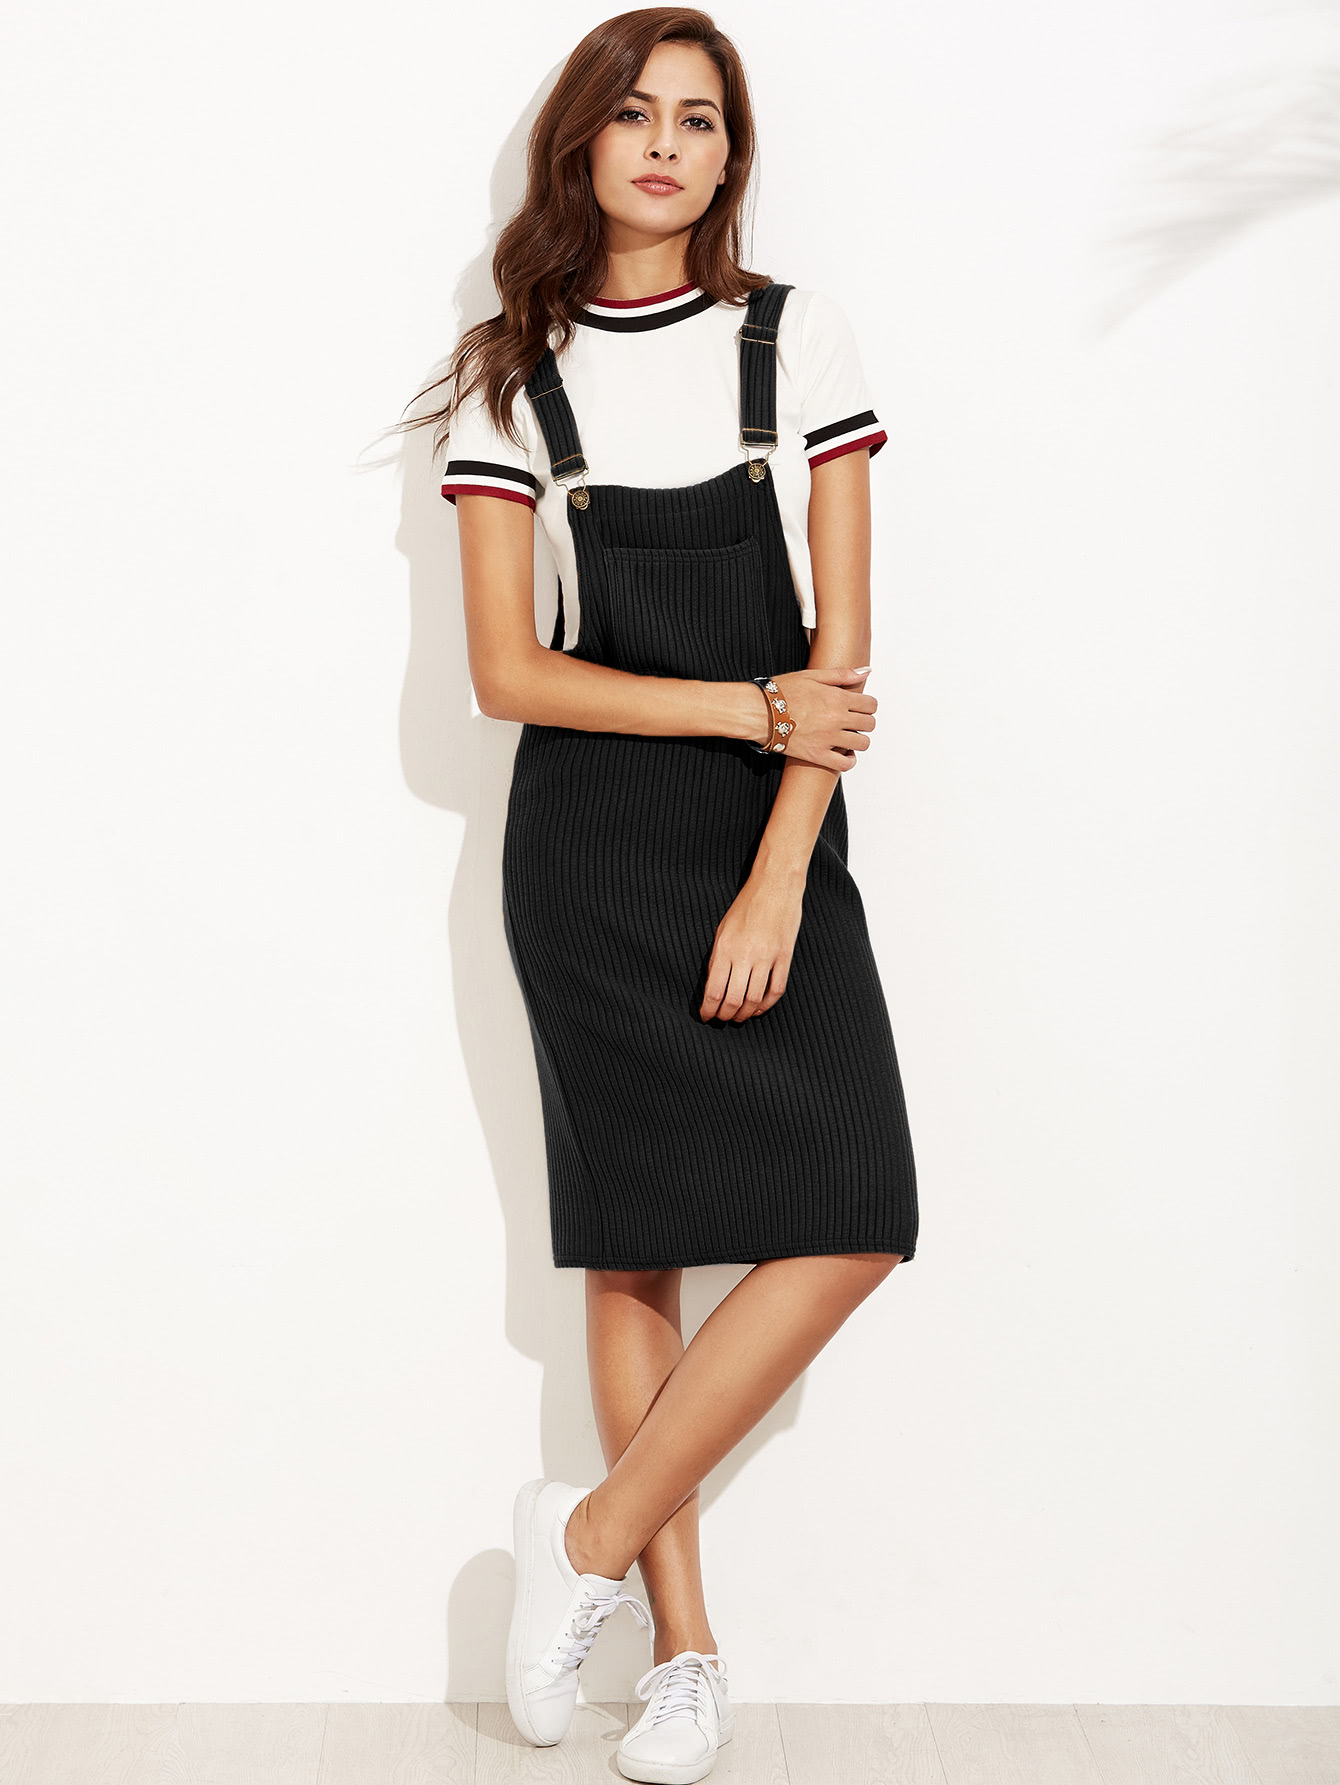 Ribbed Dungaree Dress With Pocket dress160906121